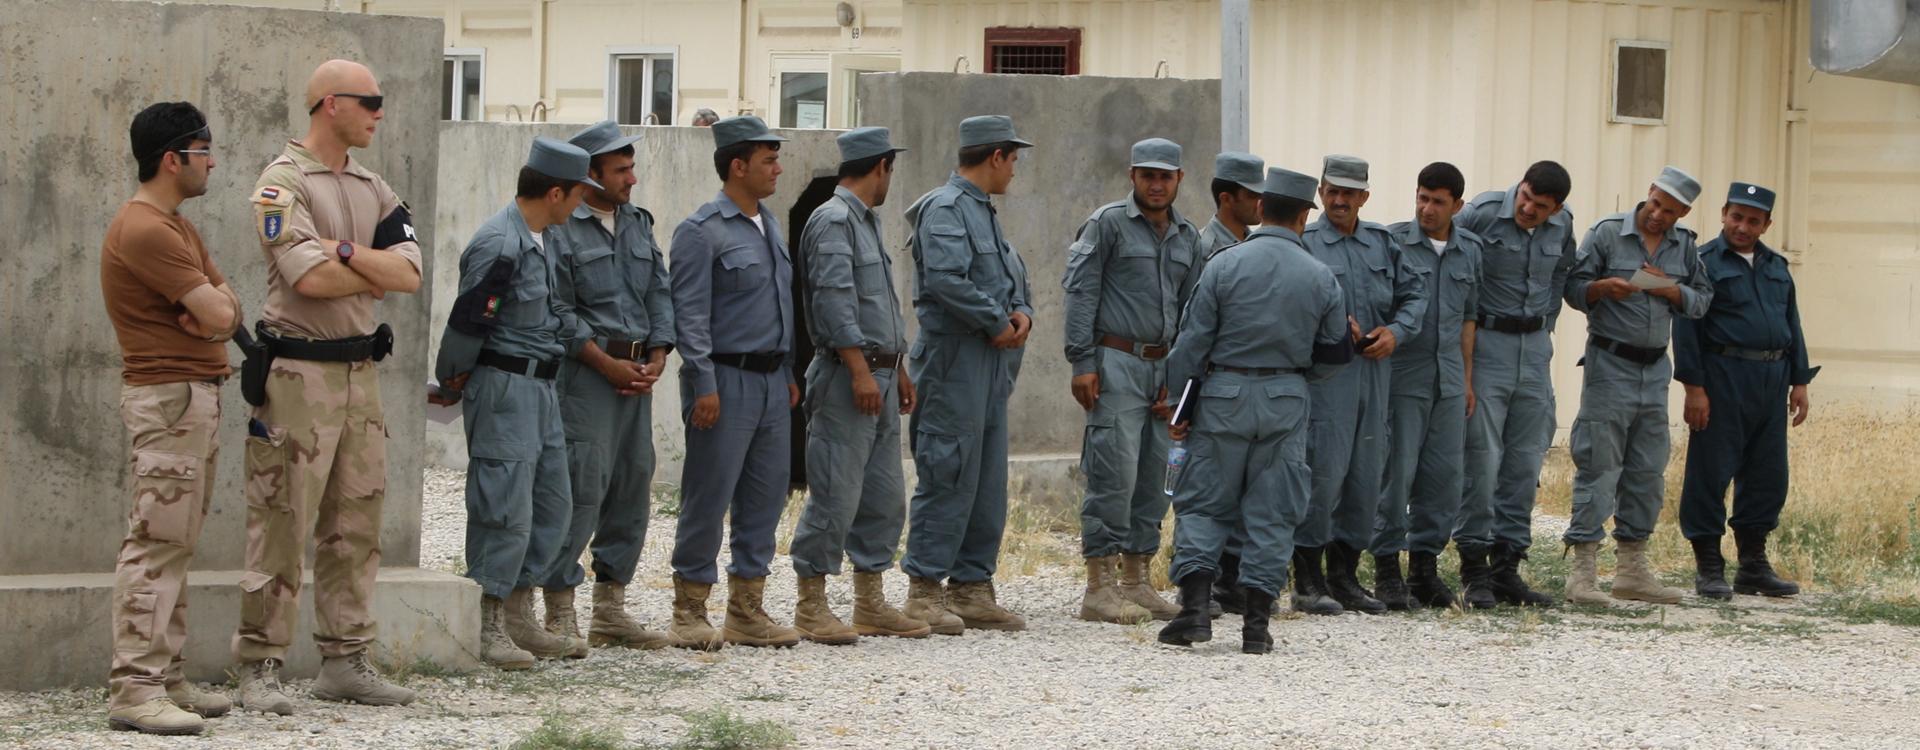 Politietraining in Kunduz, 2013 (foto:flickr/eupolafgmedia)